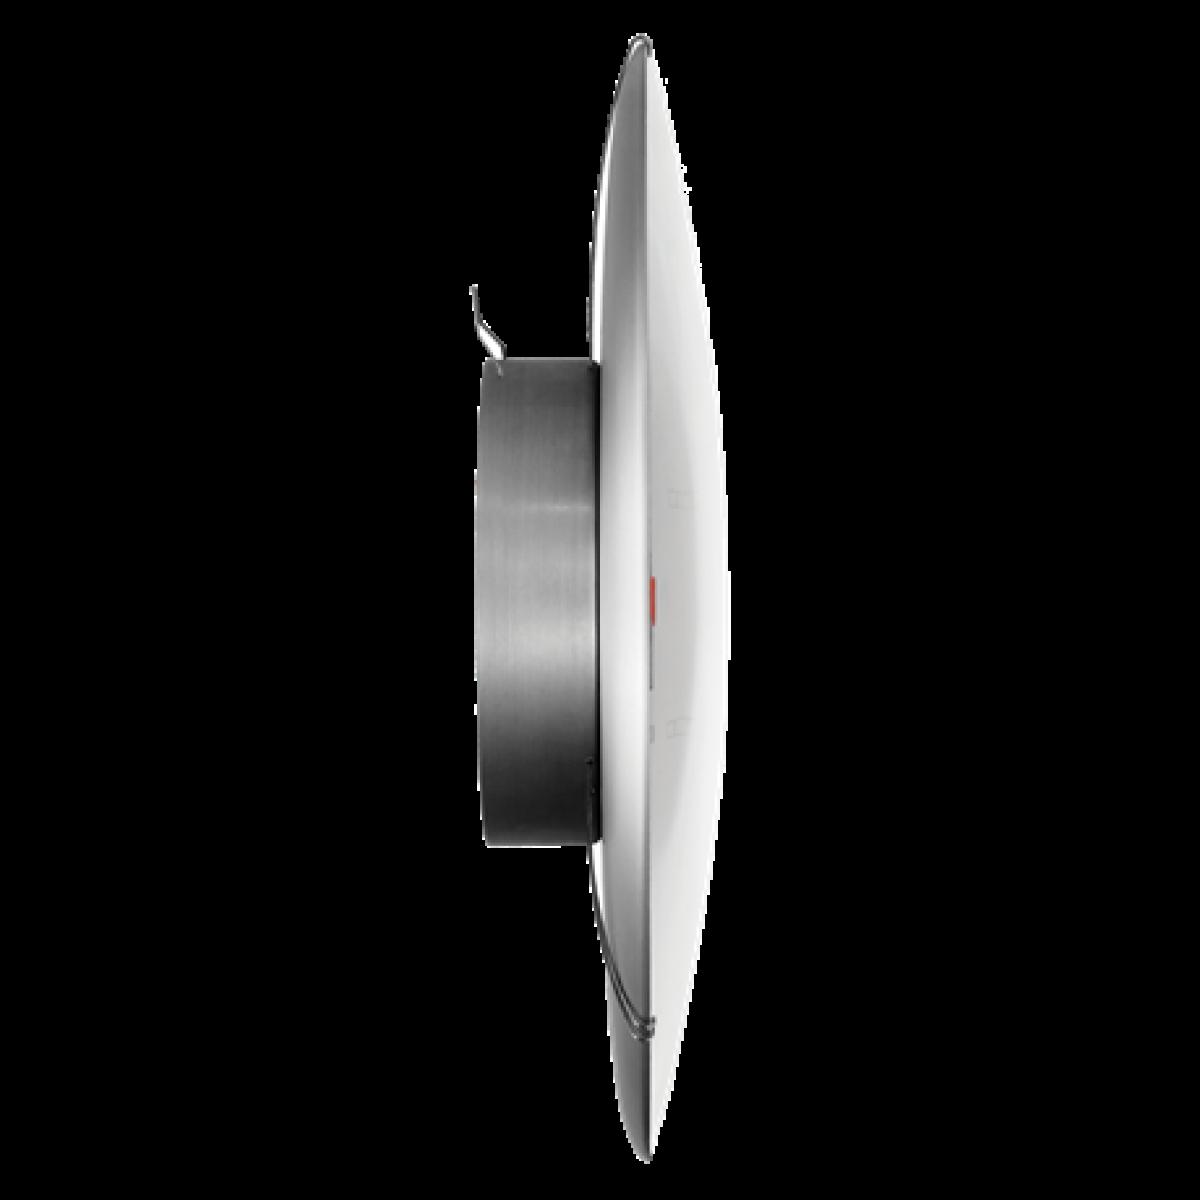 ARNEJACOBSENRomanvgur21cm-07